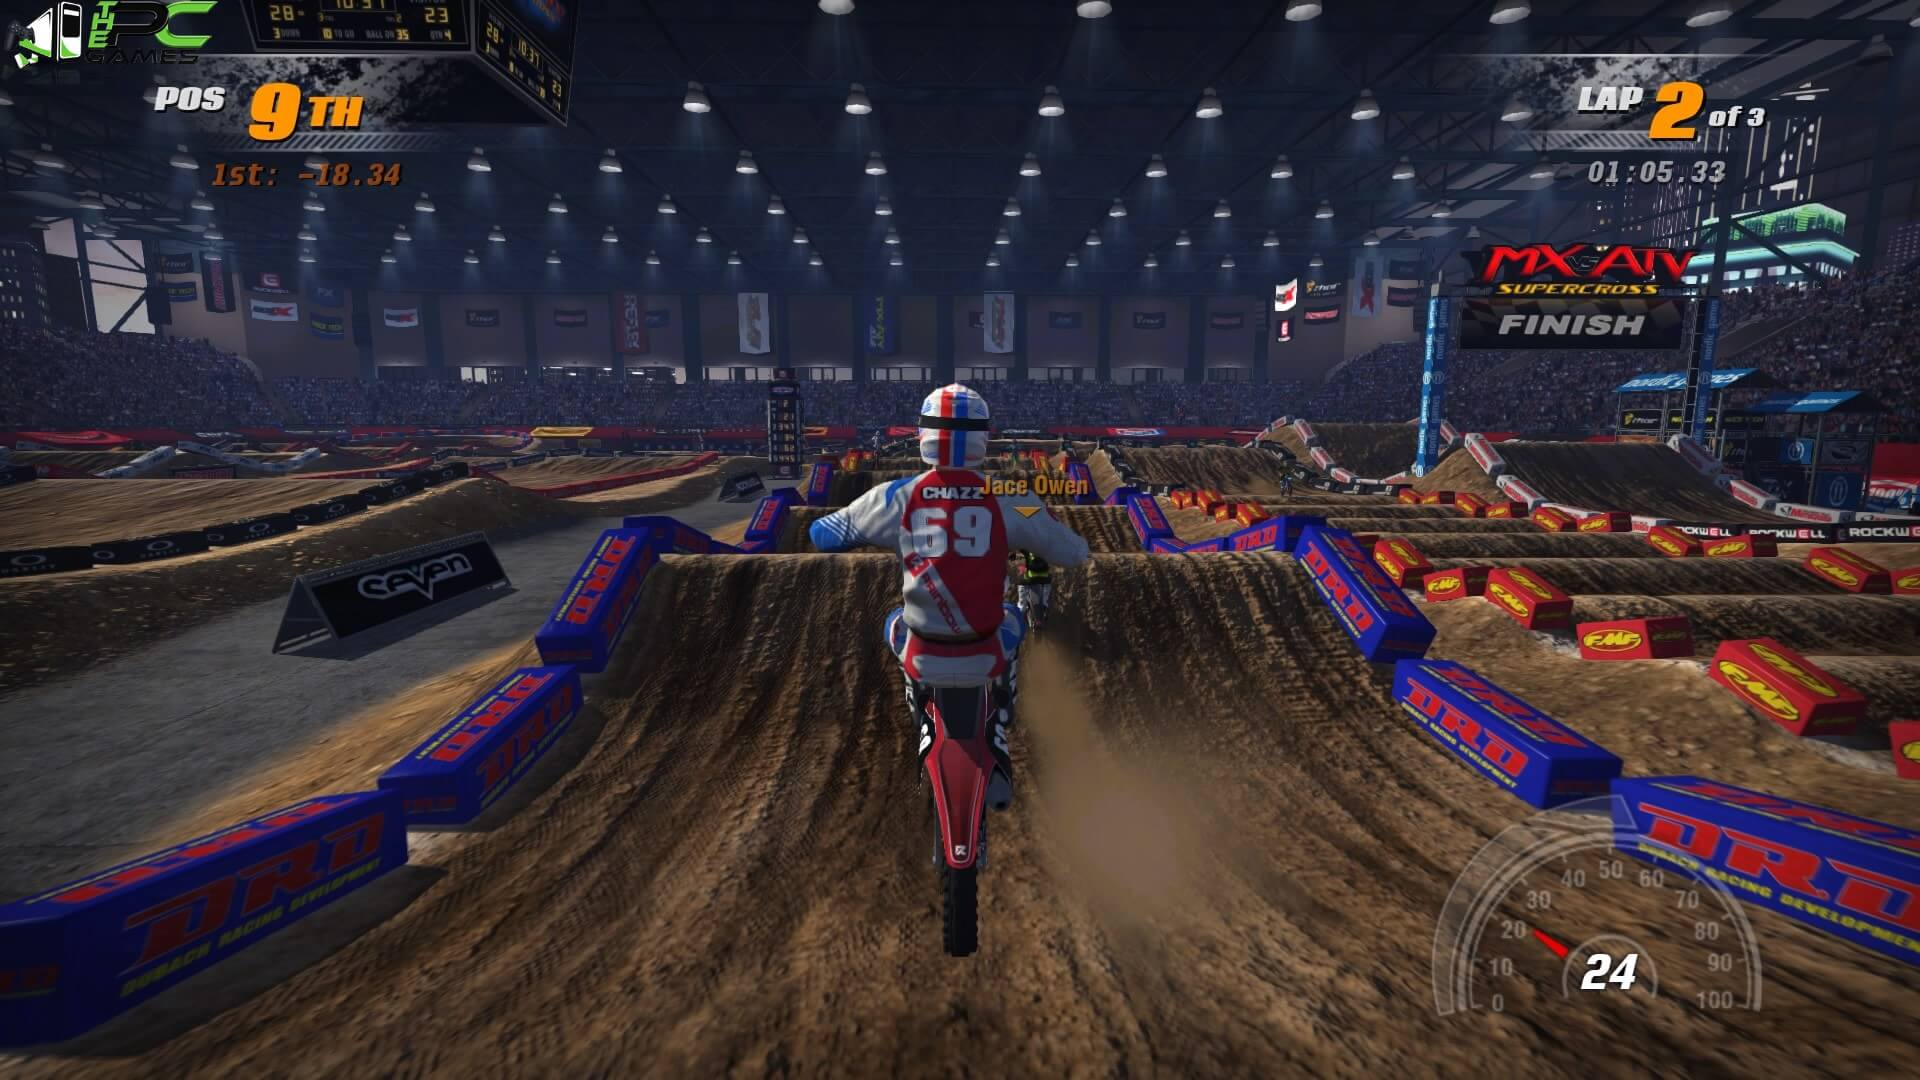 MX vs ATV Reflex Free Download Full PC Game - enlard.com